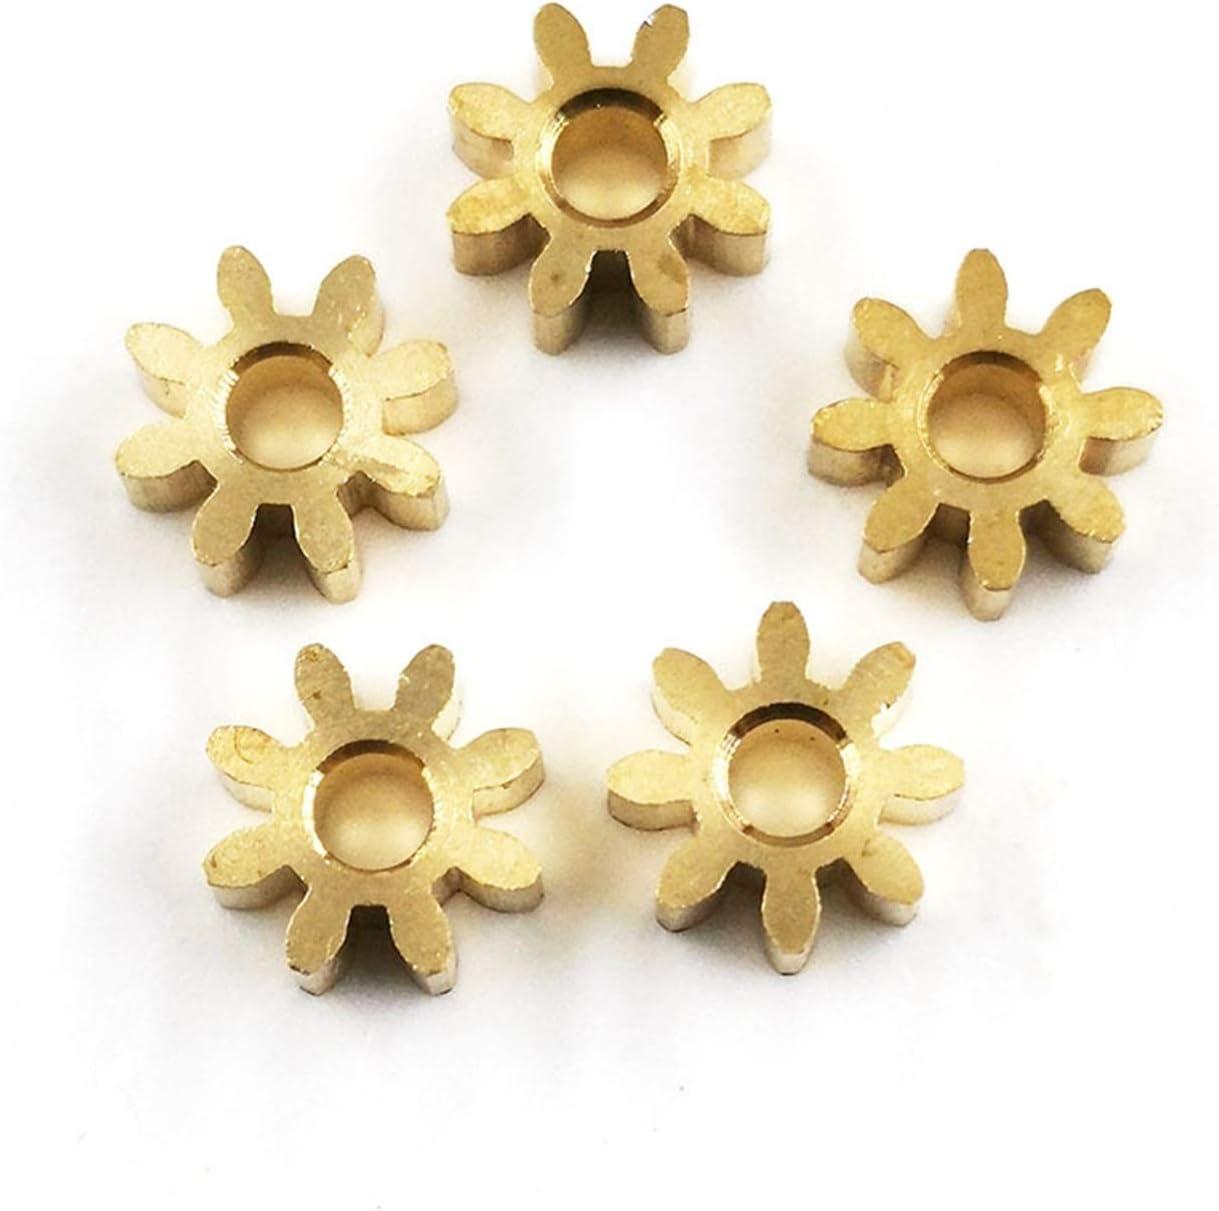 TMP1105 82A Gears 0.6M Copper Pinion 2.5mm Diameter List price 6mm Width 5 ☆ popular 8